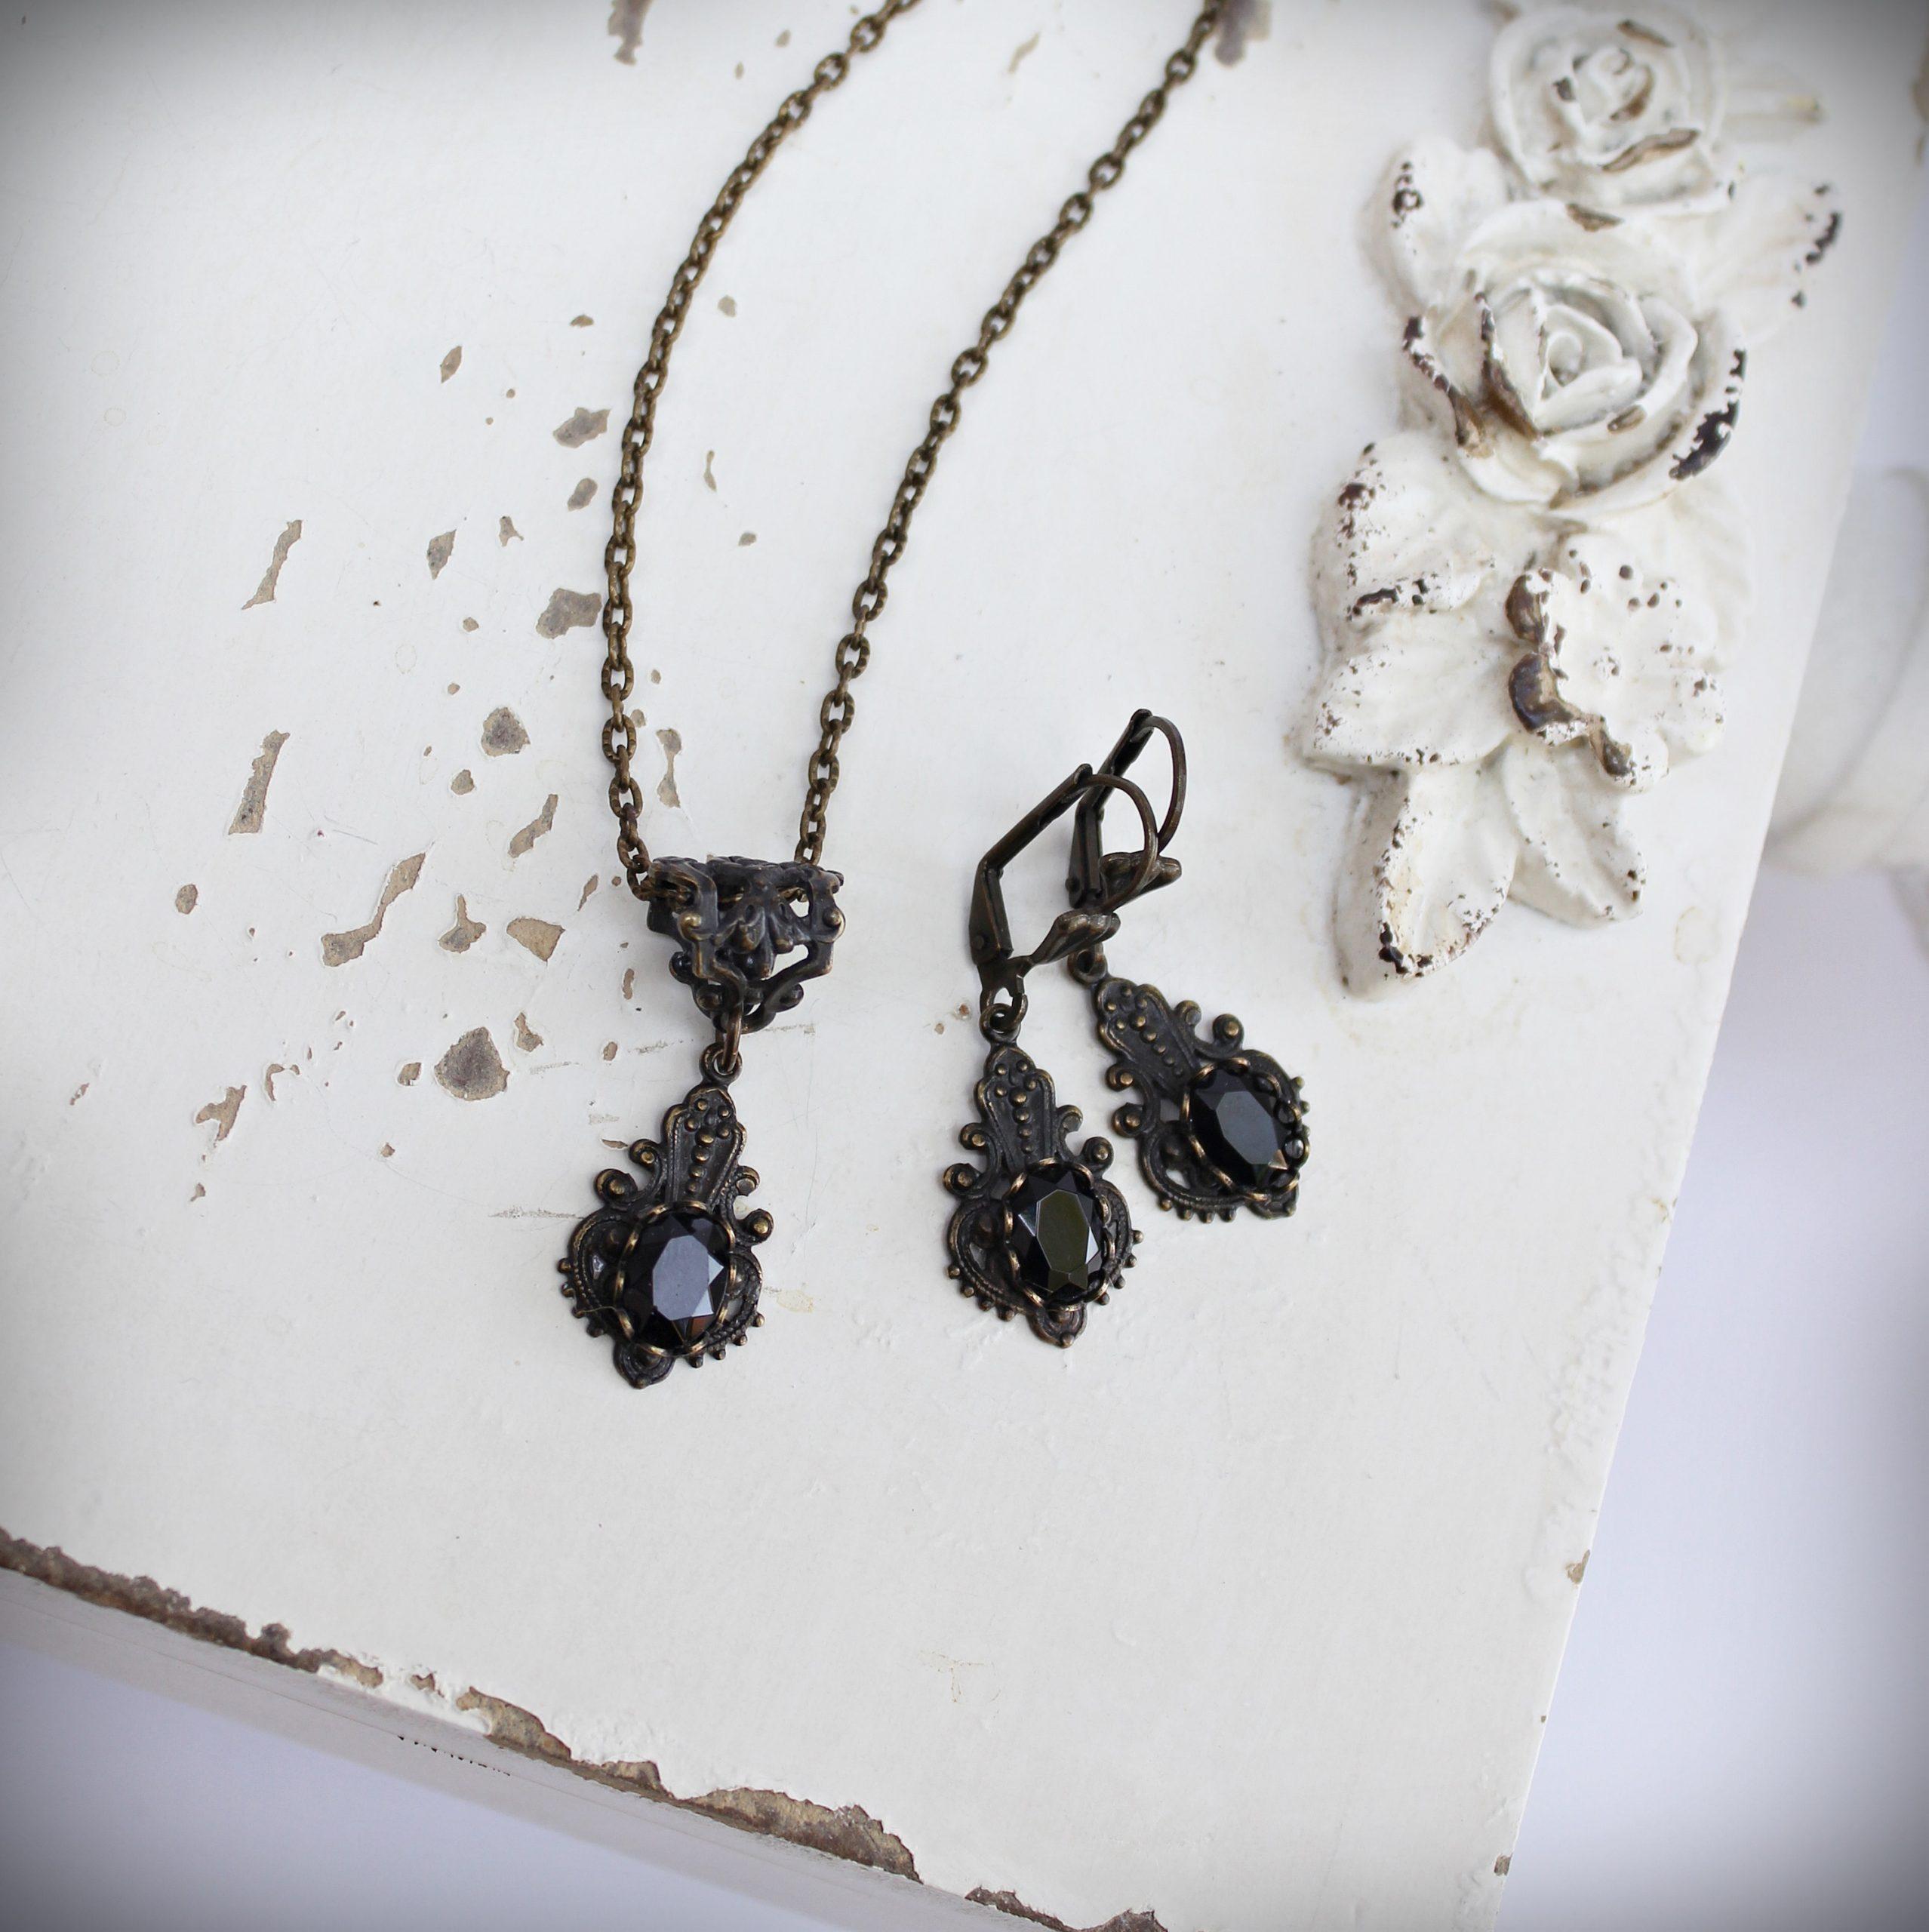 classic black onyx necklace earrings set